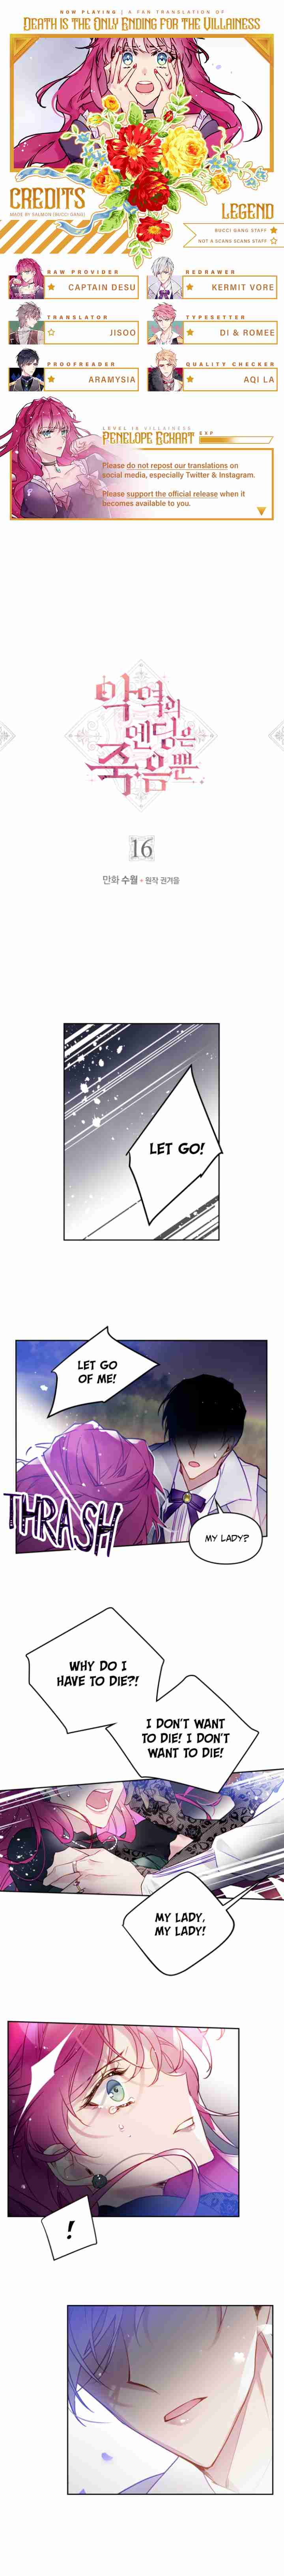 https://manga.mangadogs.com/comics/pic3/52/37492/1512878/9f8f593af6b09a7d68c36ed5a2a56b3e.jpg Page 1